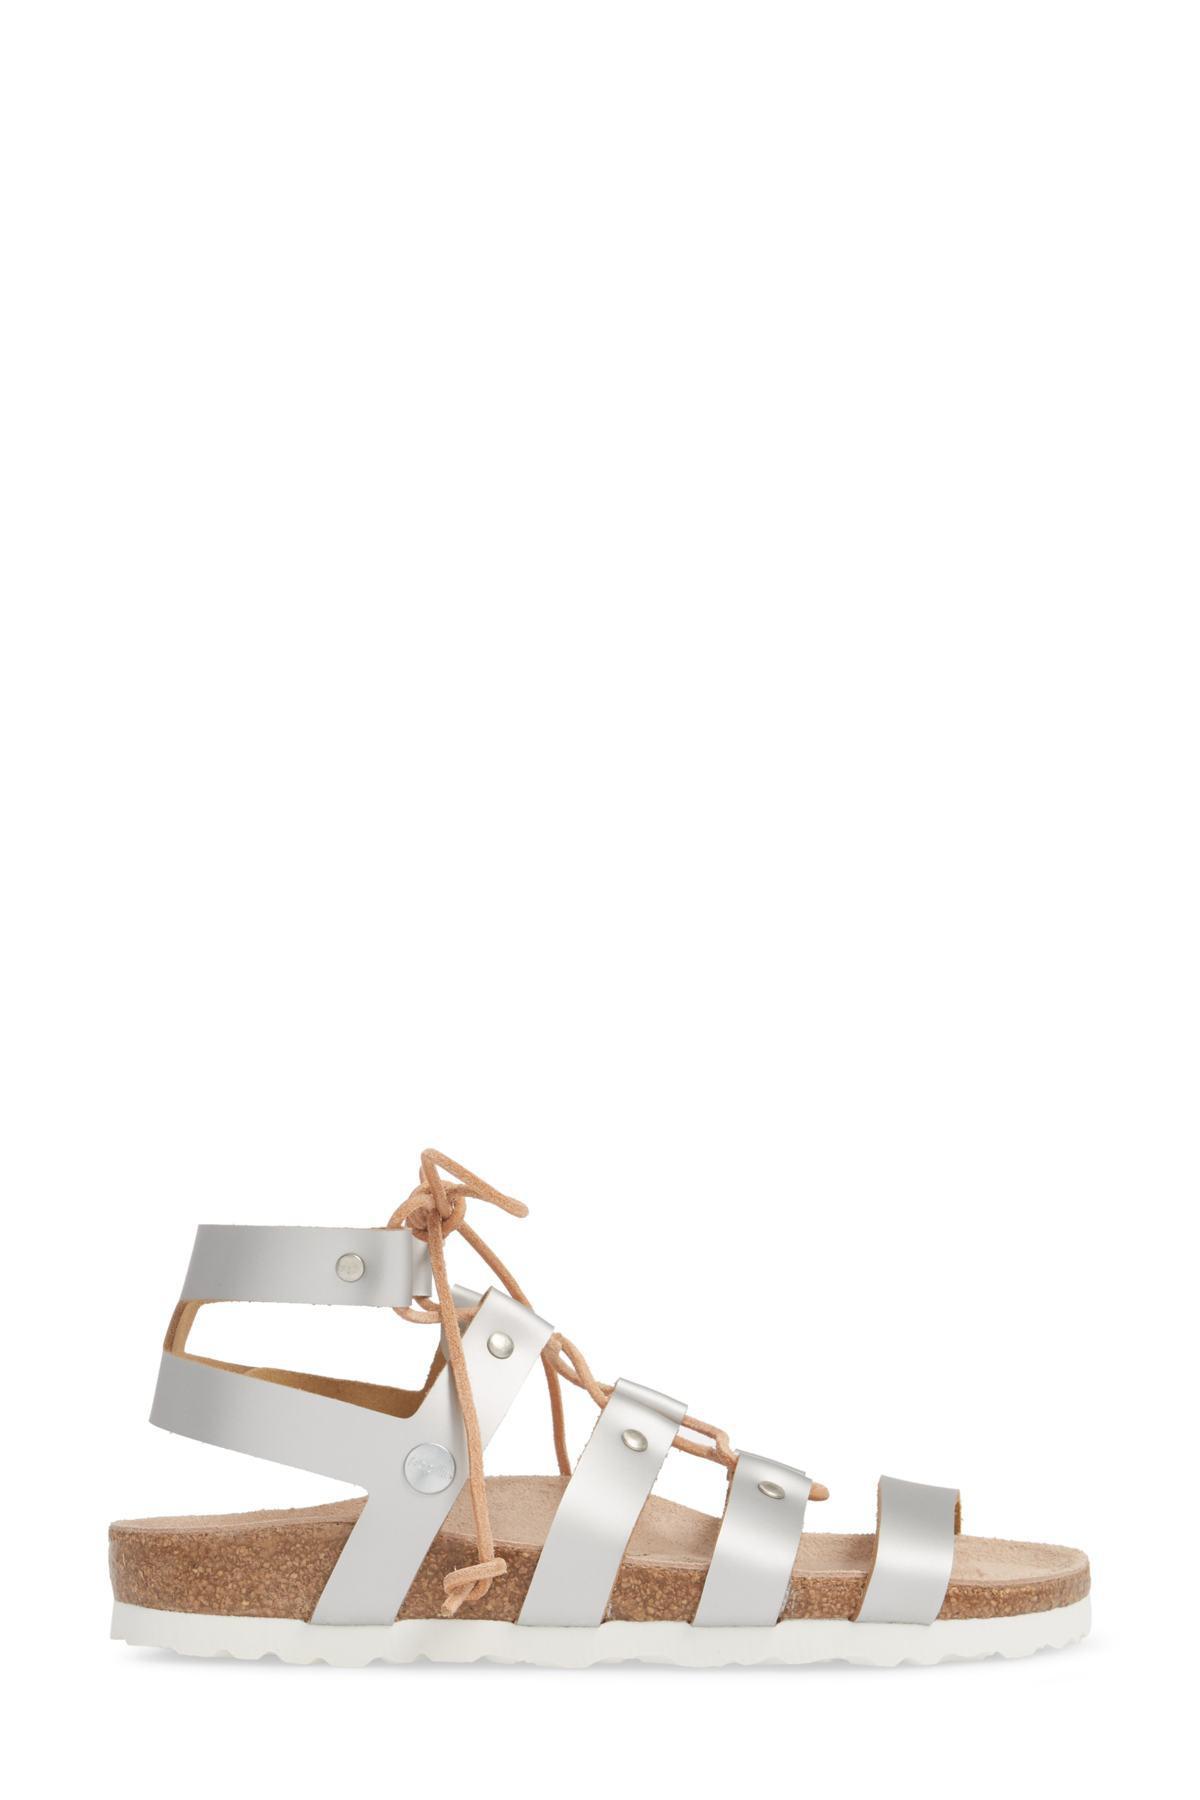 5bd28230d21 Birkenstock - Metallic Papillio By Cleo Gladiator Sandal (women) - Lyst.  View fullscreen